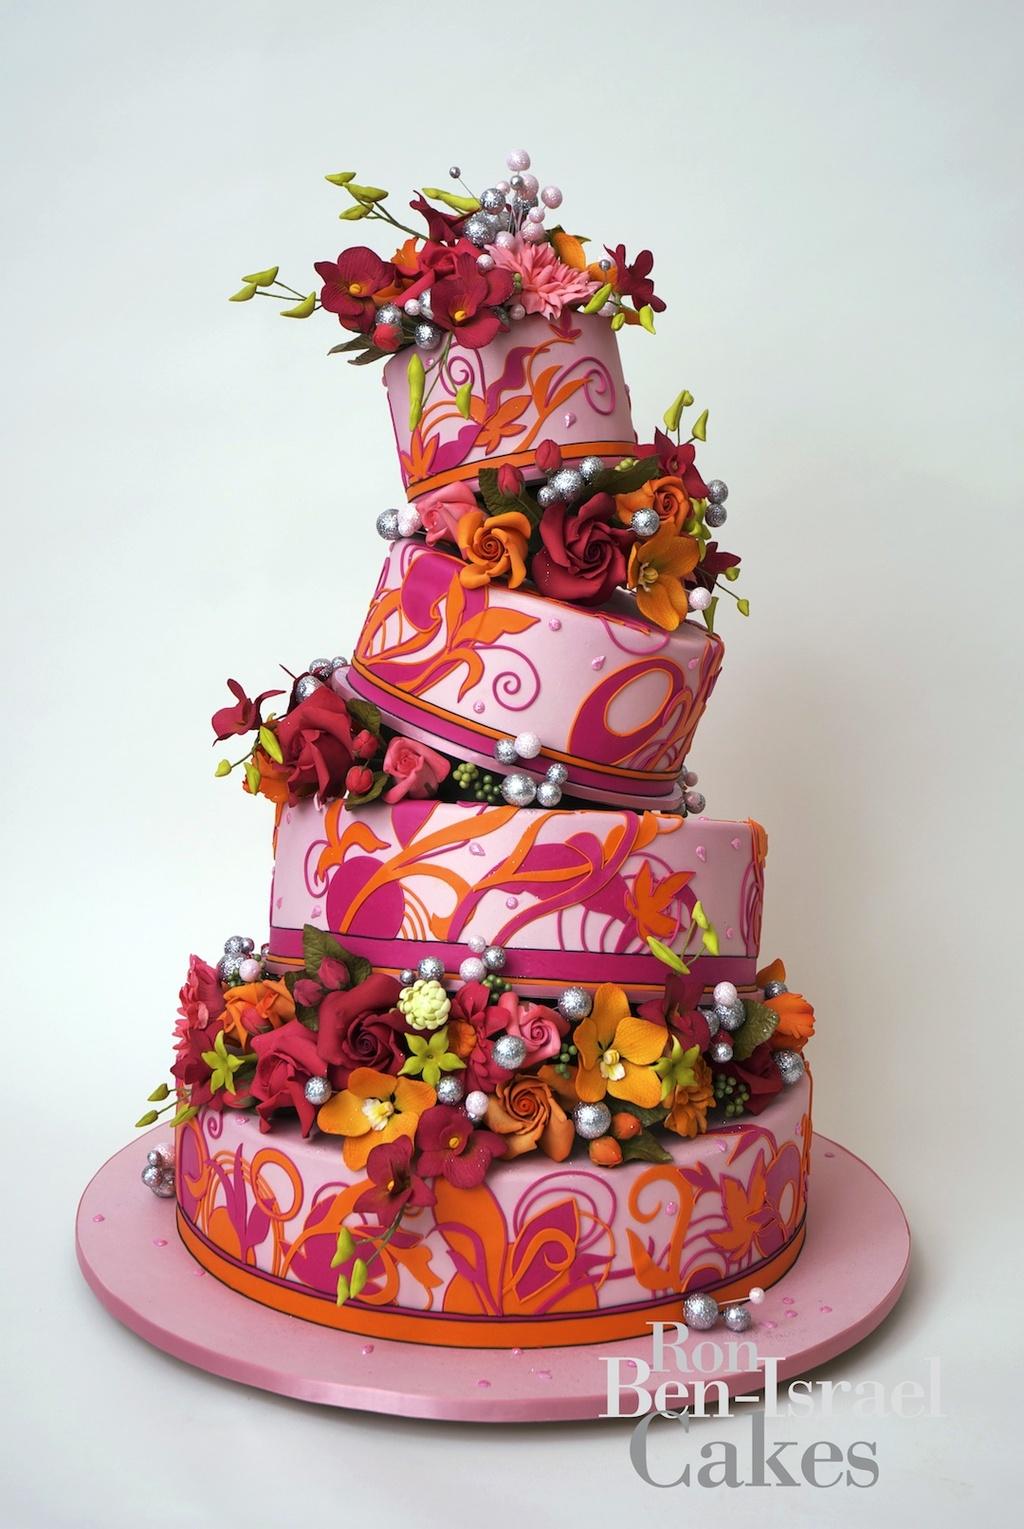 Wedding-cake-inspiration-ron-ben-isreal-wedding-cakes-pink-orange-funky-floral.original.full